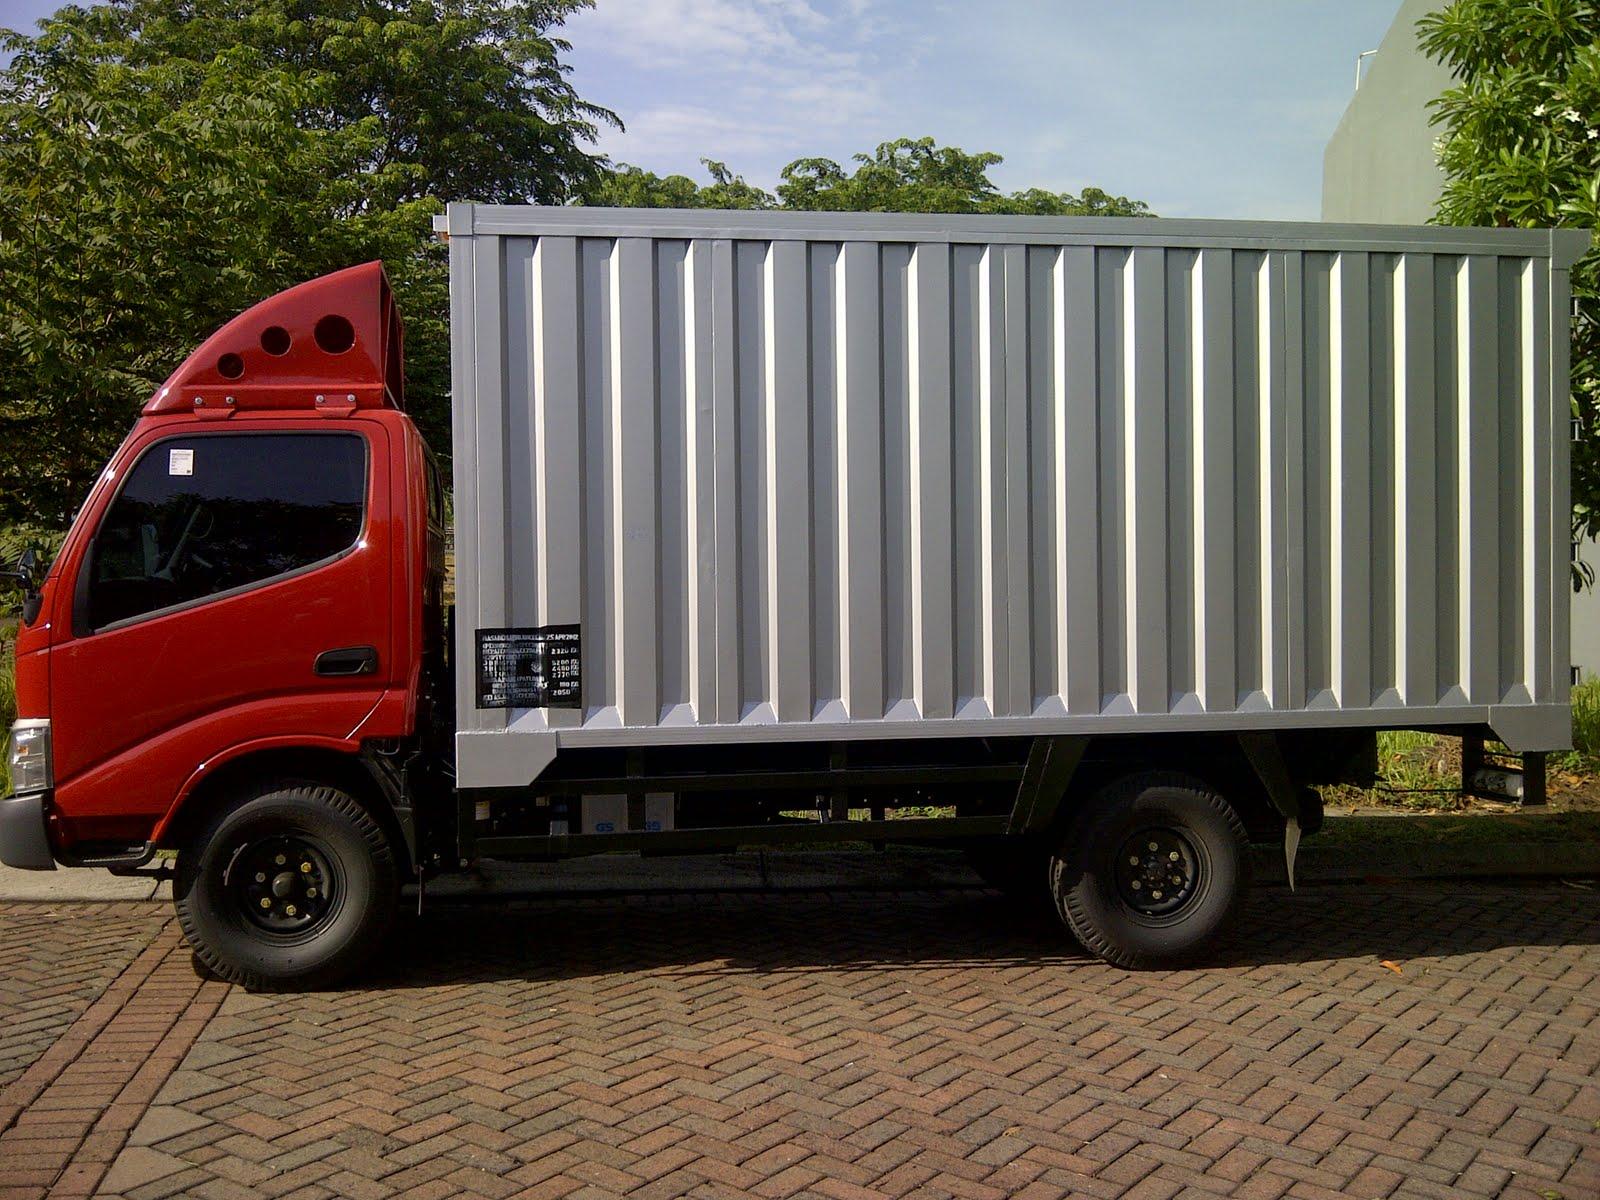 sewa mobil truk sewa mobil box sewa truck untuk pindahan rumah dan kiriman barang sewa. Black Bedroom Furniture Sets. Home Design Ideas